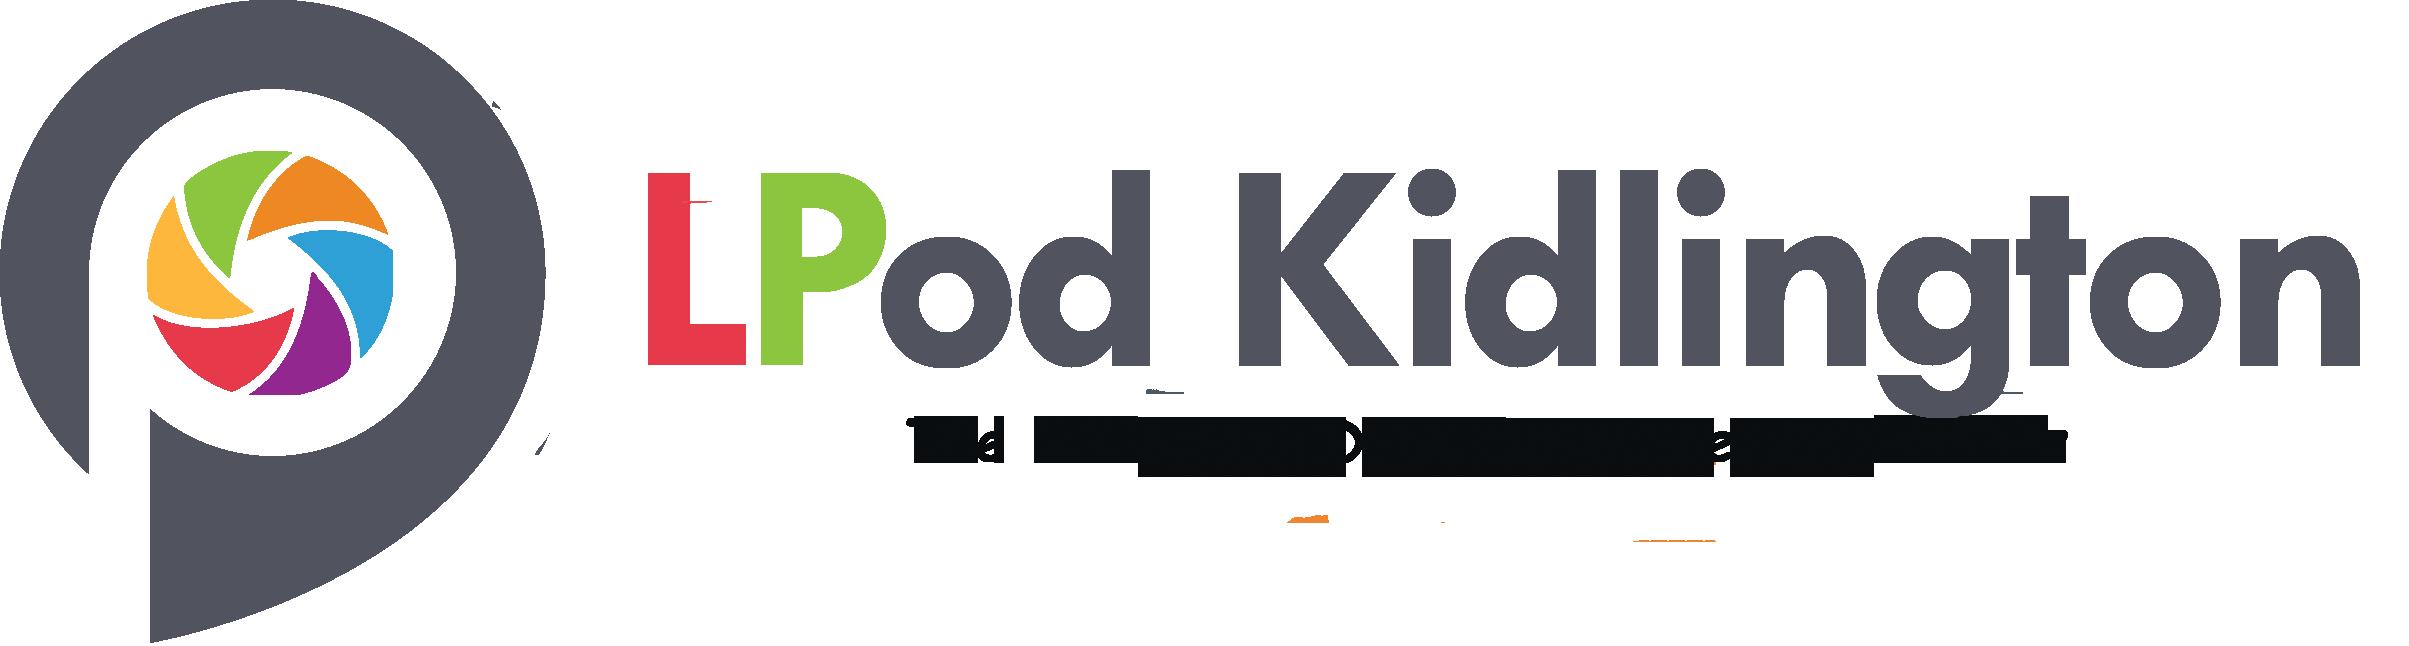 intensive driving courses kidlington, intensive driving lessons kidlington, intensive driving school kidlington